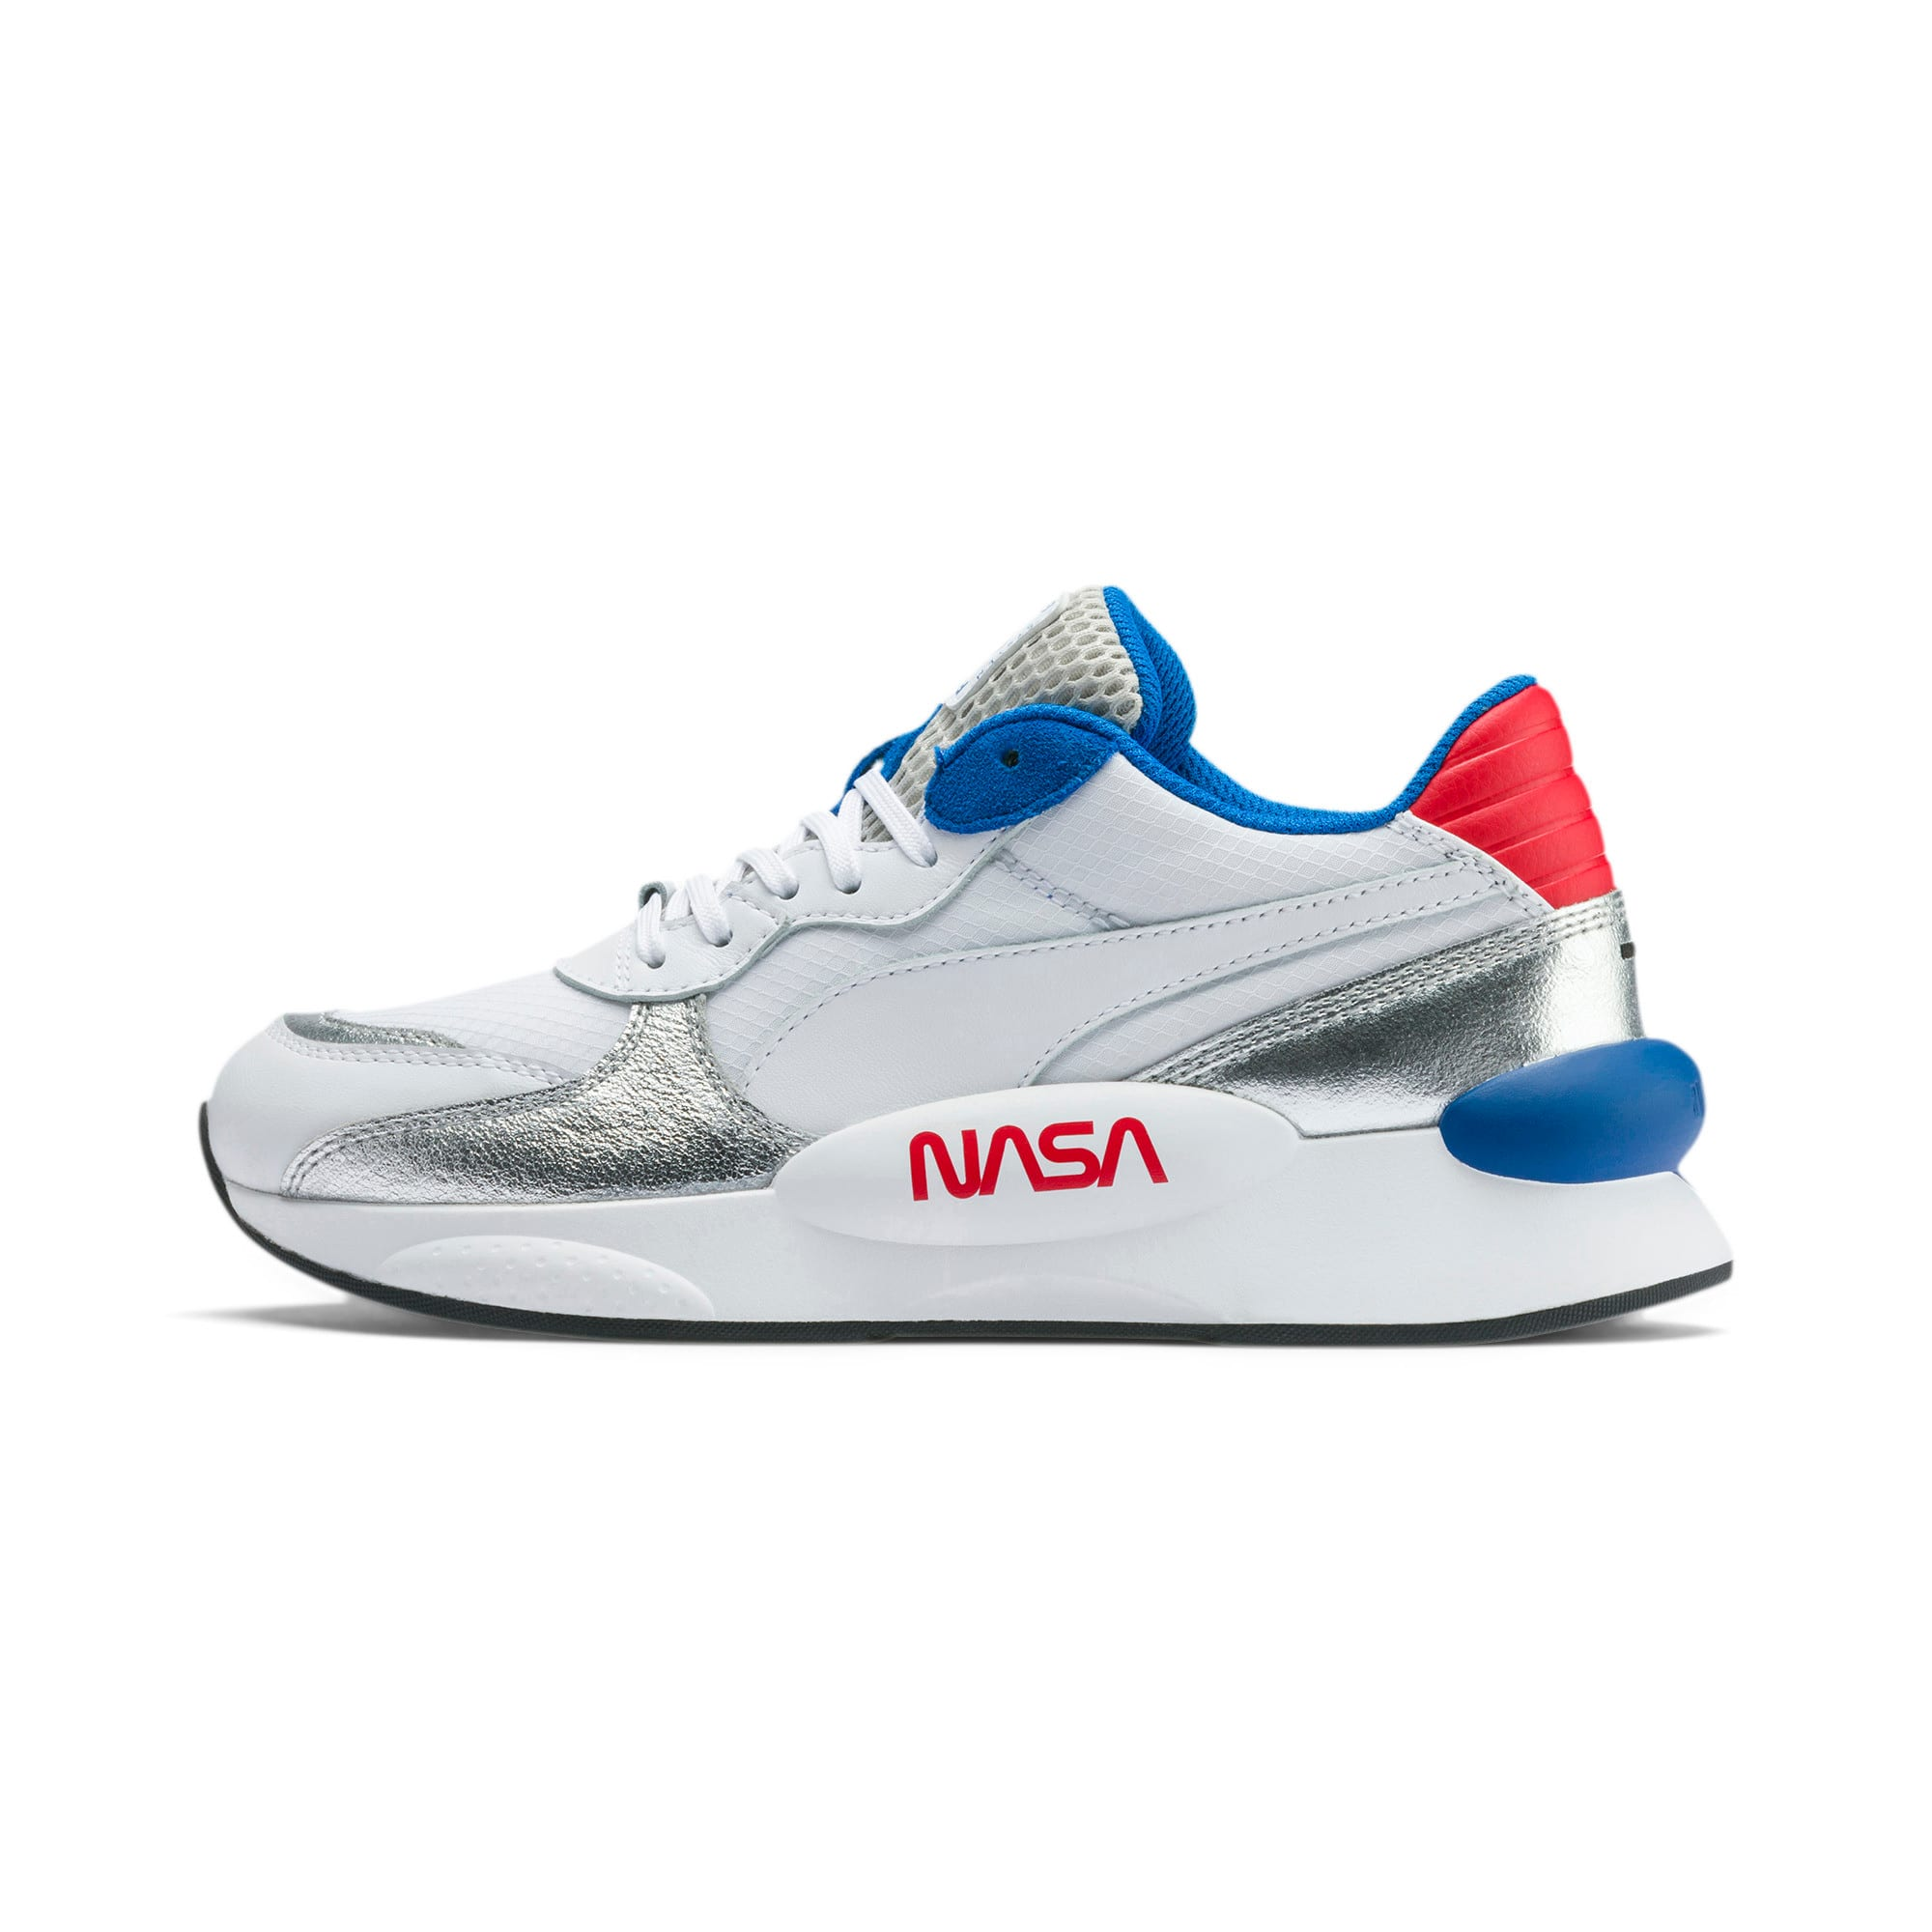 Thumbnail 1 of RS 9.8 Space Agency Sneakers JR, Puma White-Puma Silver, medium